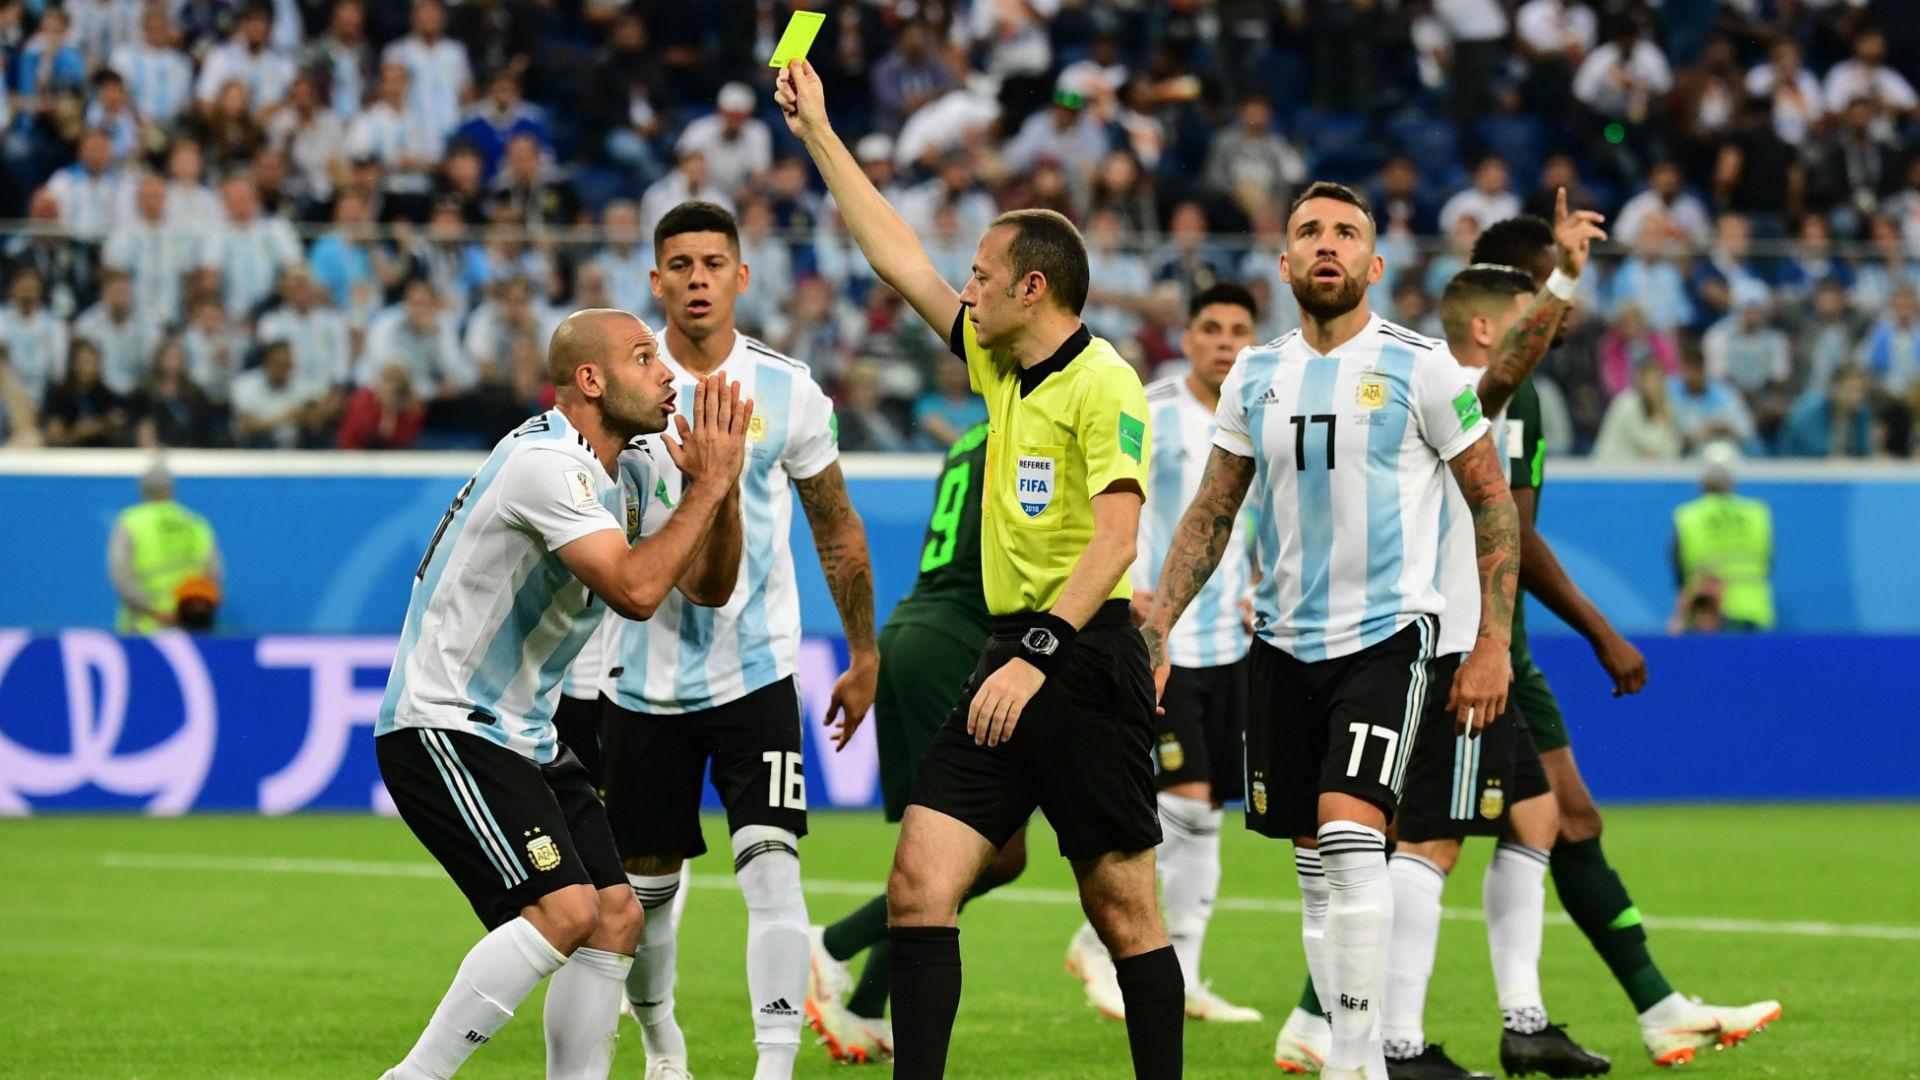 Mascherano Argentina Nigeria World Cup Russi 2018 26062018